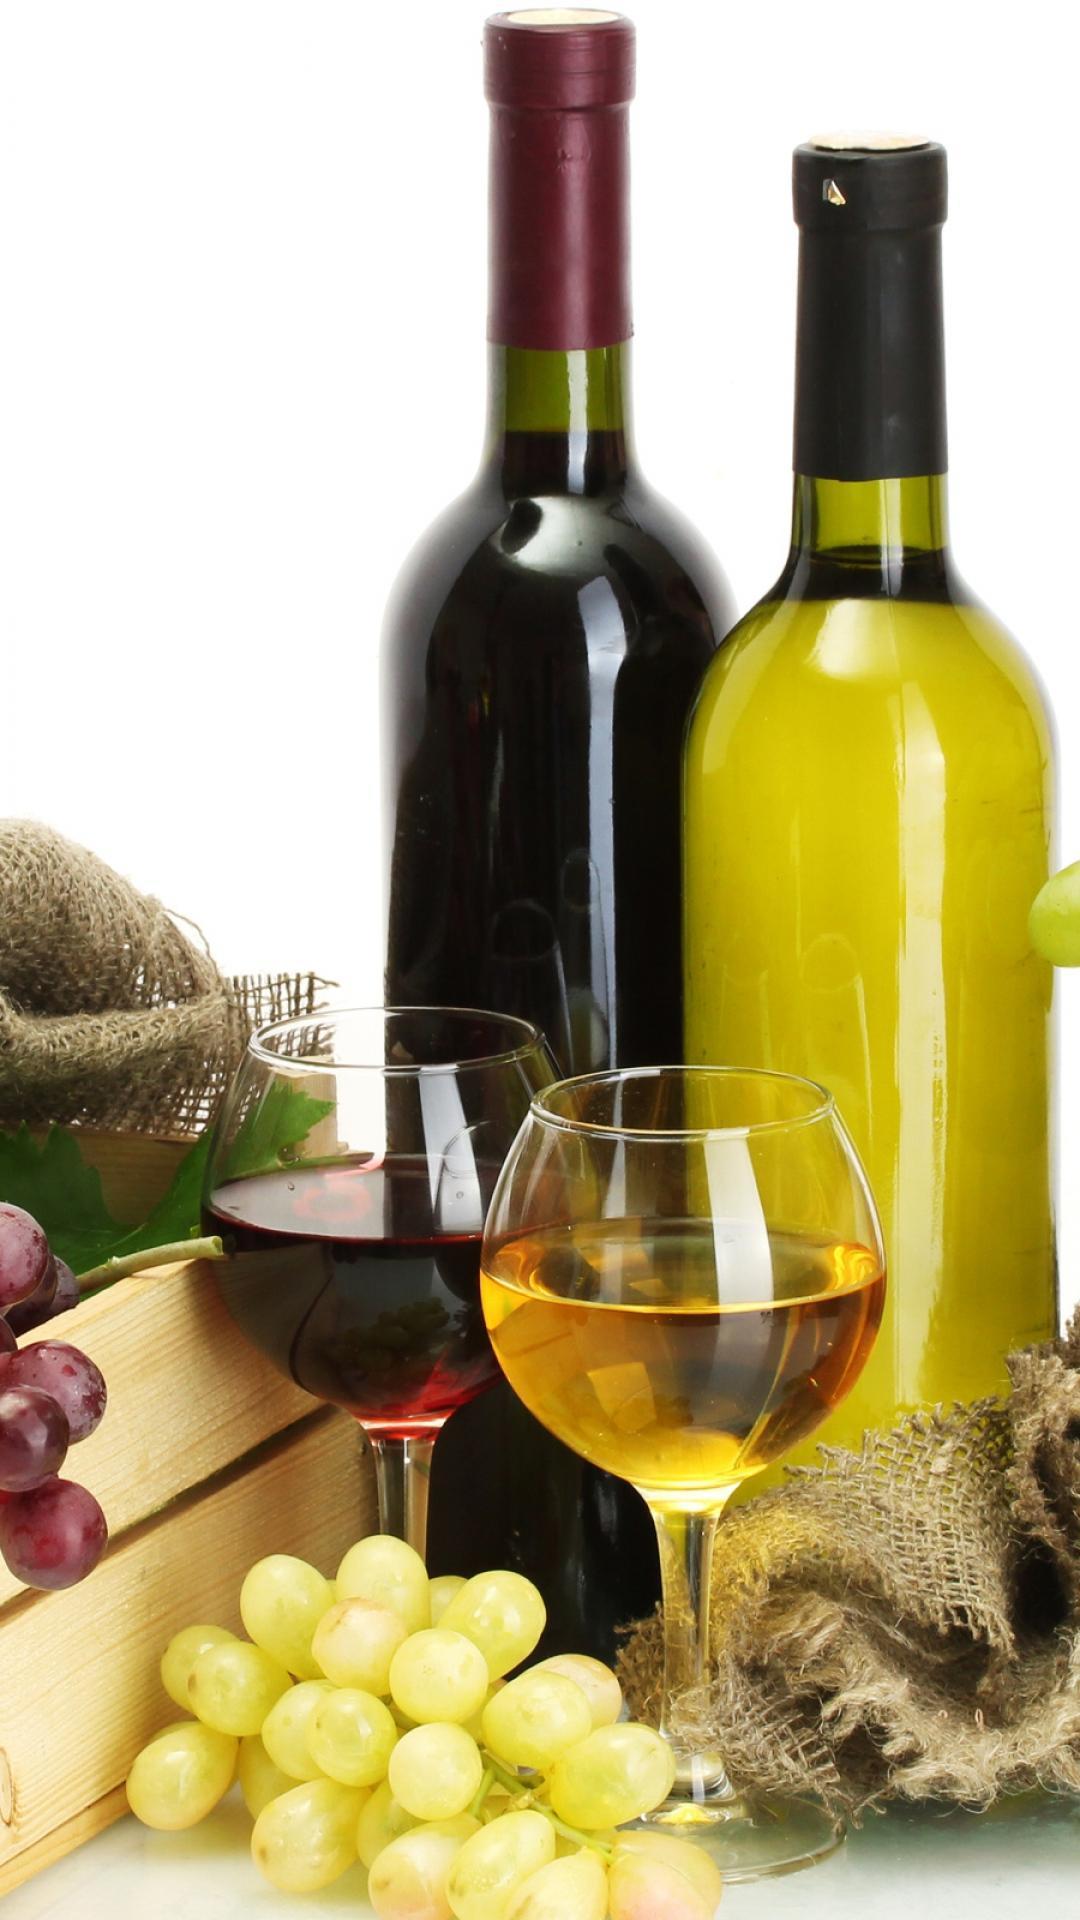 Wine Bottles Wallpapers - Wallpaper Cave